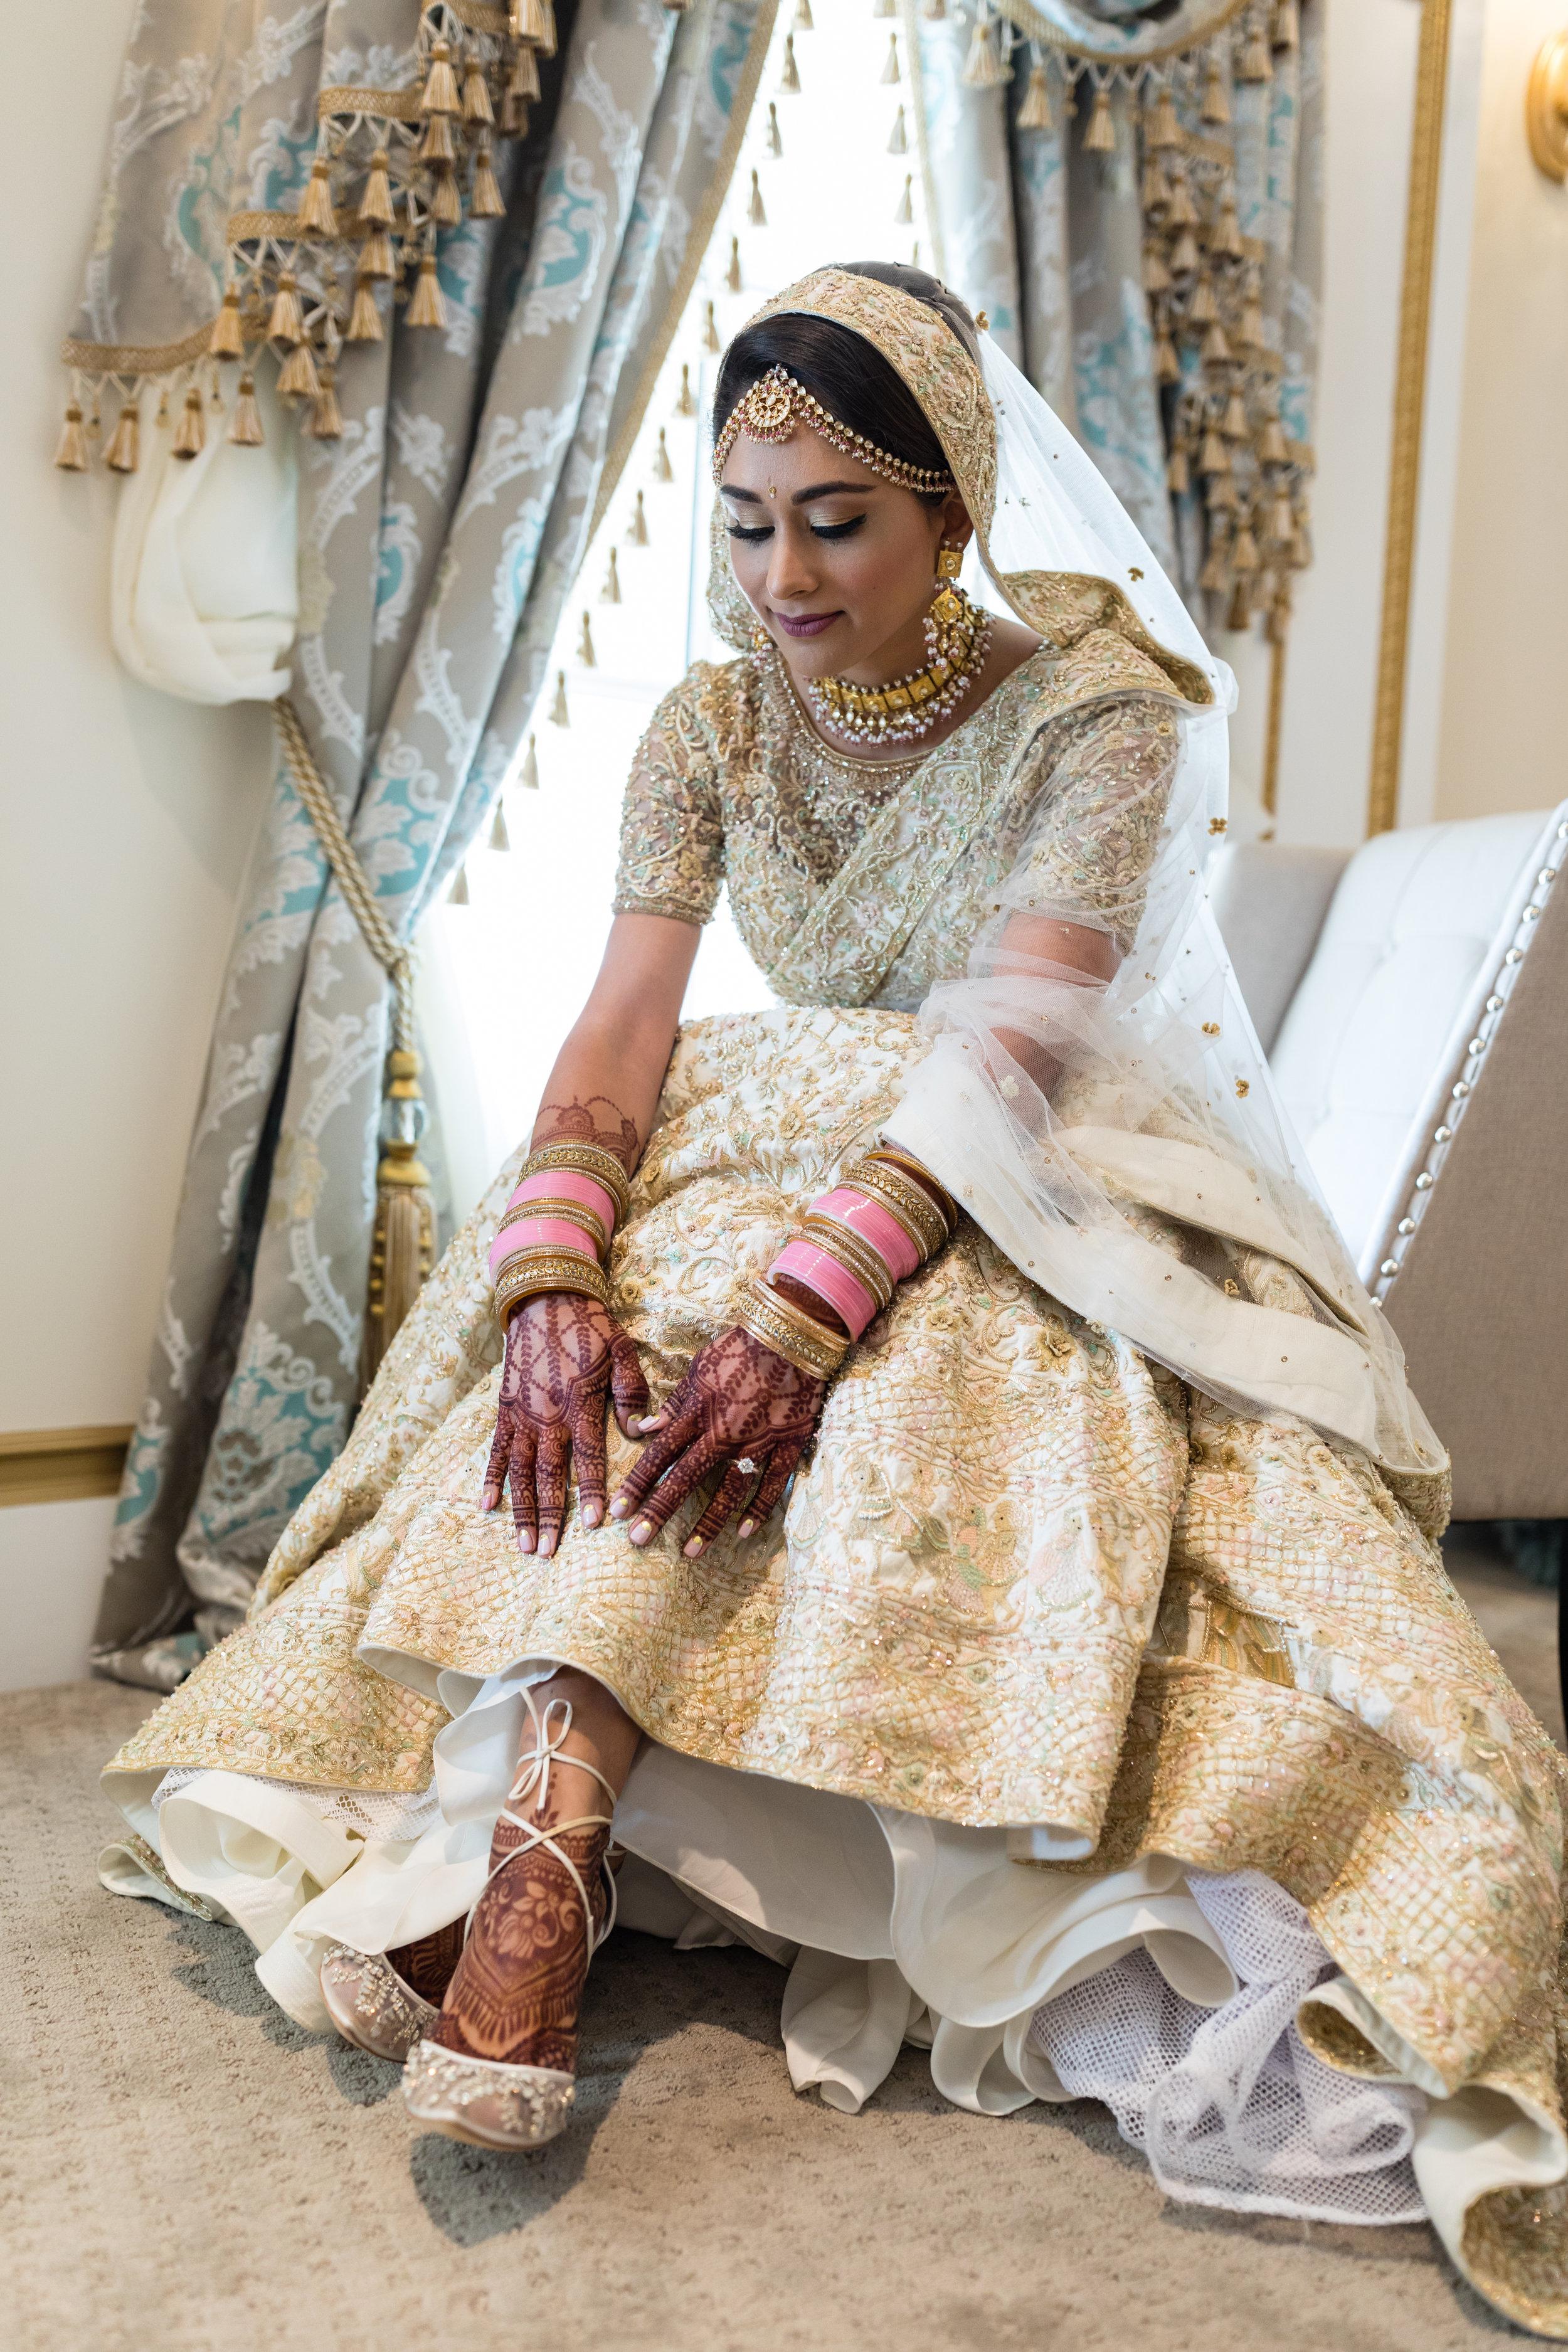 INDIAN WEDDING BRIDE FULLSIZE.jpg